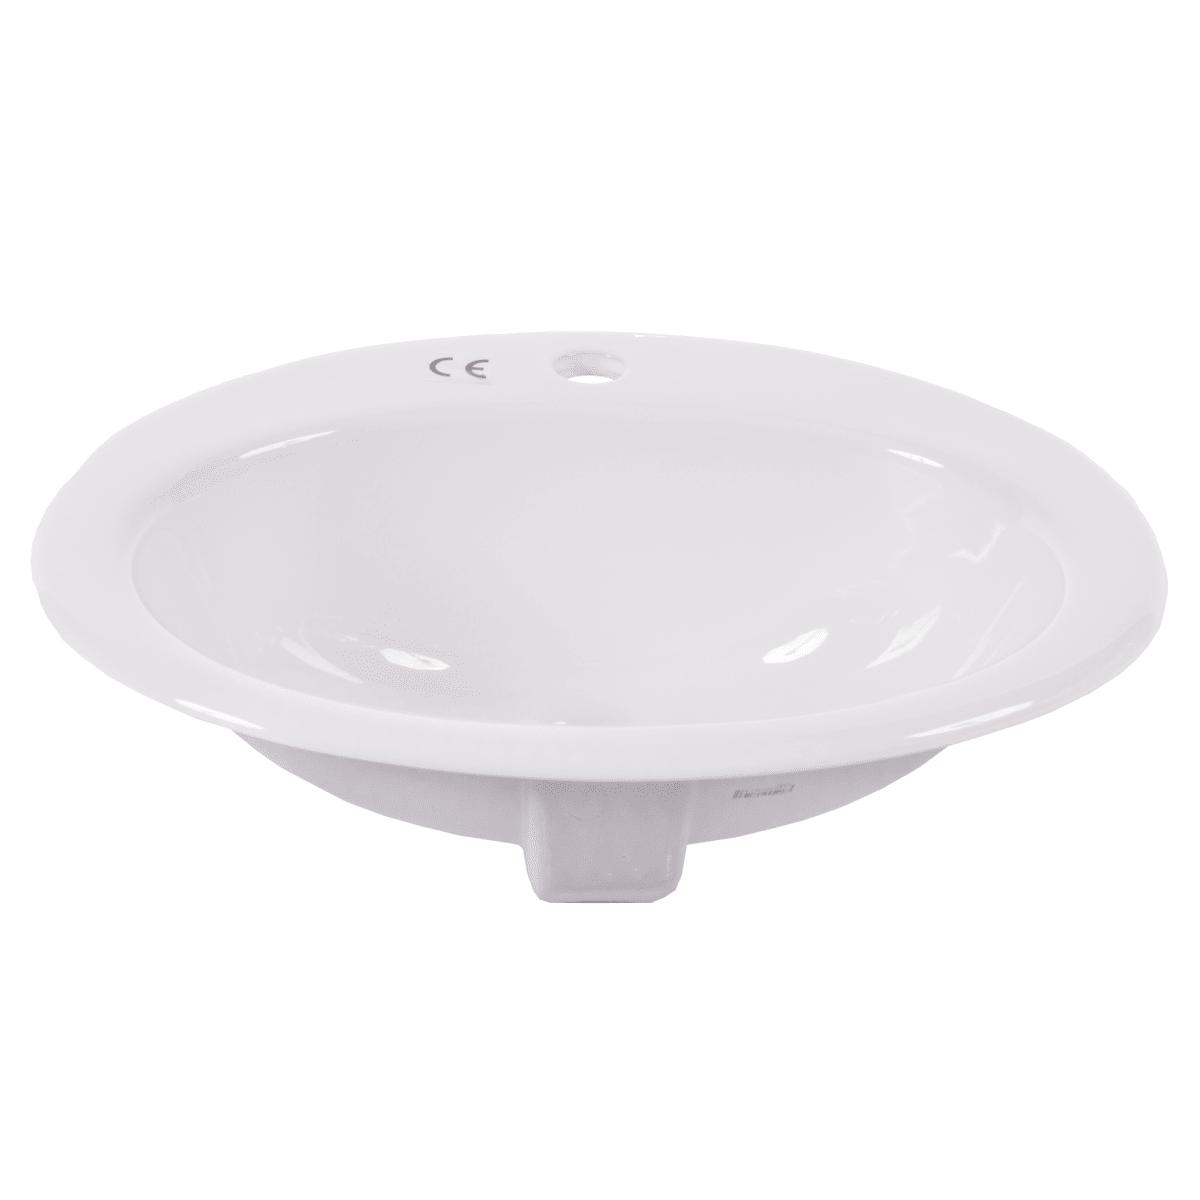 Раковина круглая Бианка 44 см, цвет белый